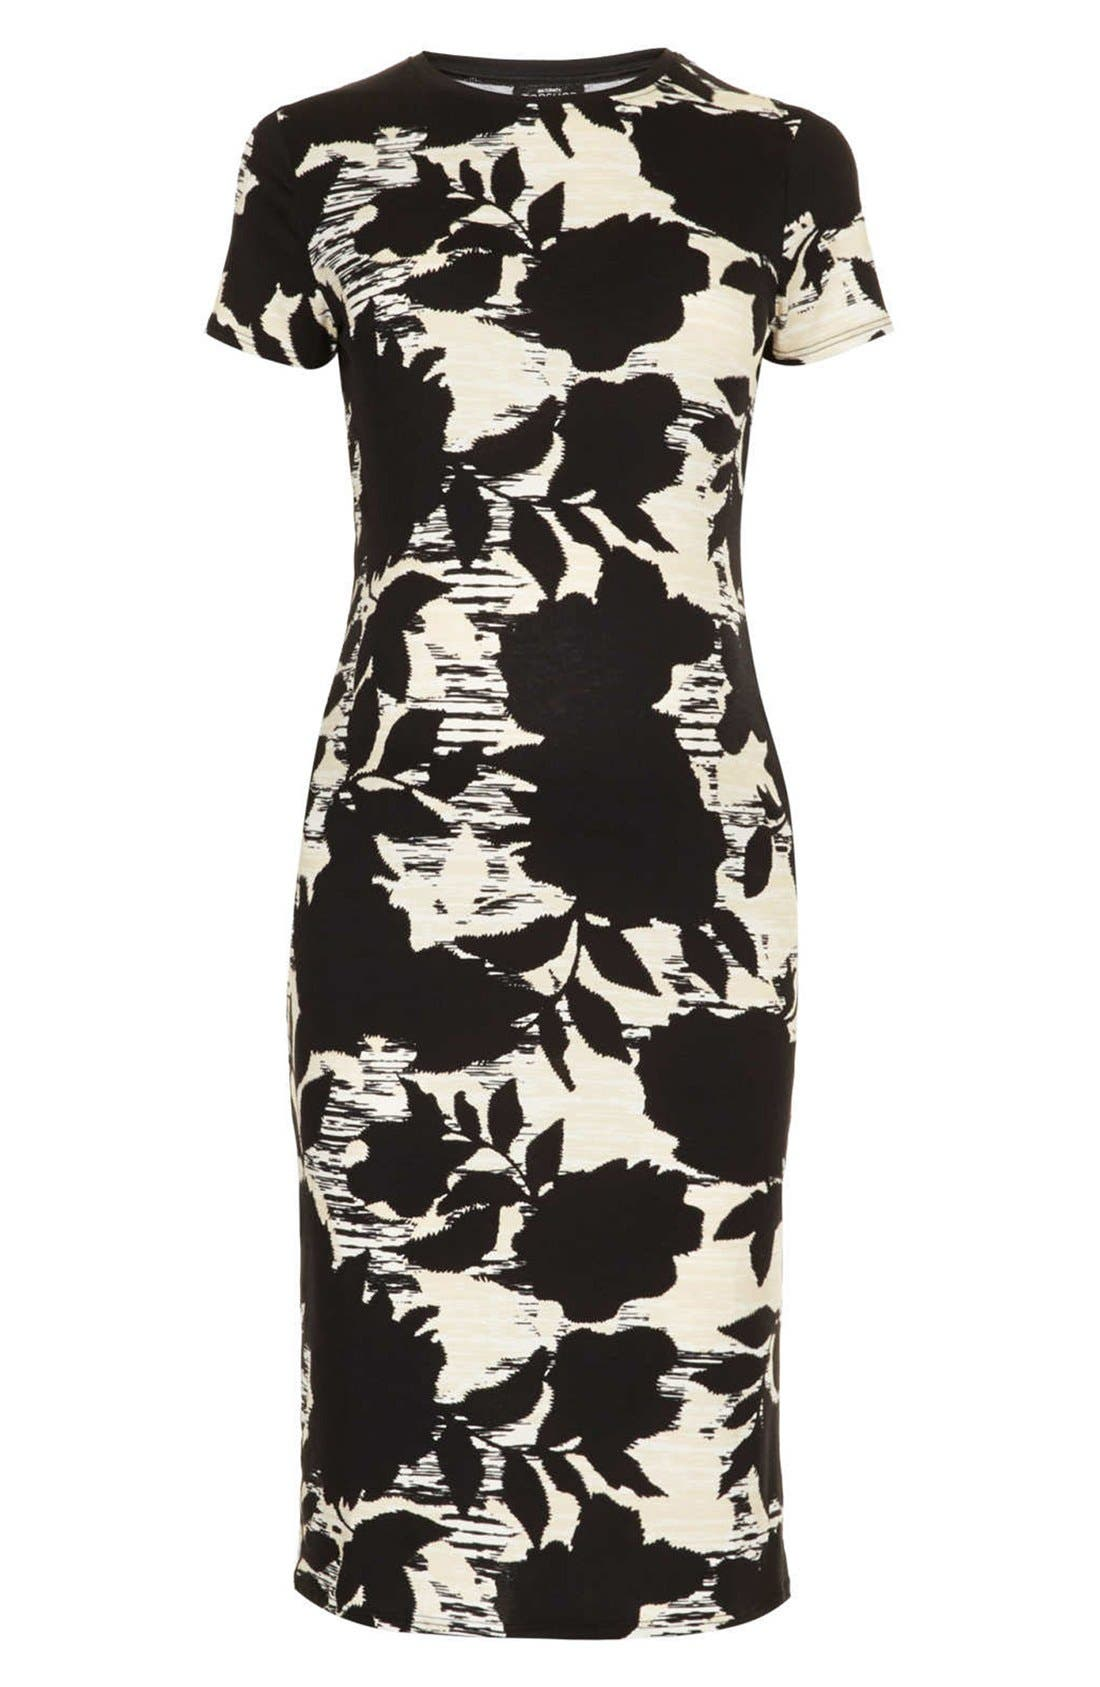 Alternate Image 1 Selected - Topshop 'Craft Dark Flower' Body-Con Maternity Dress